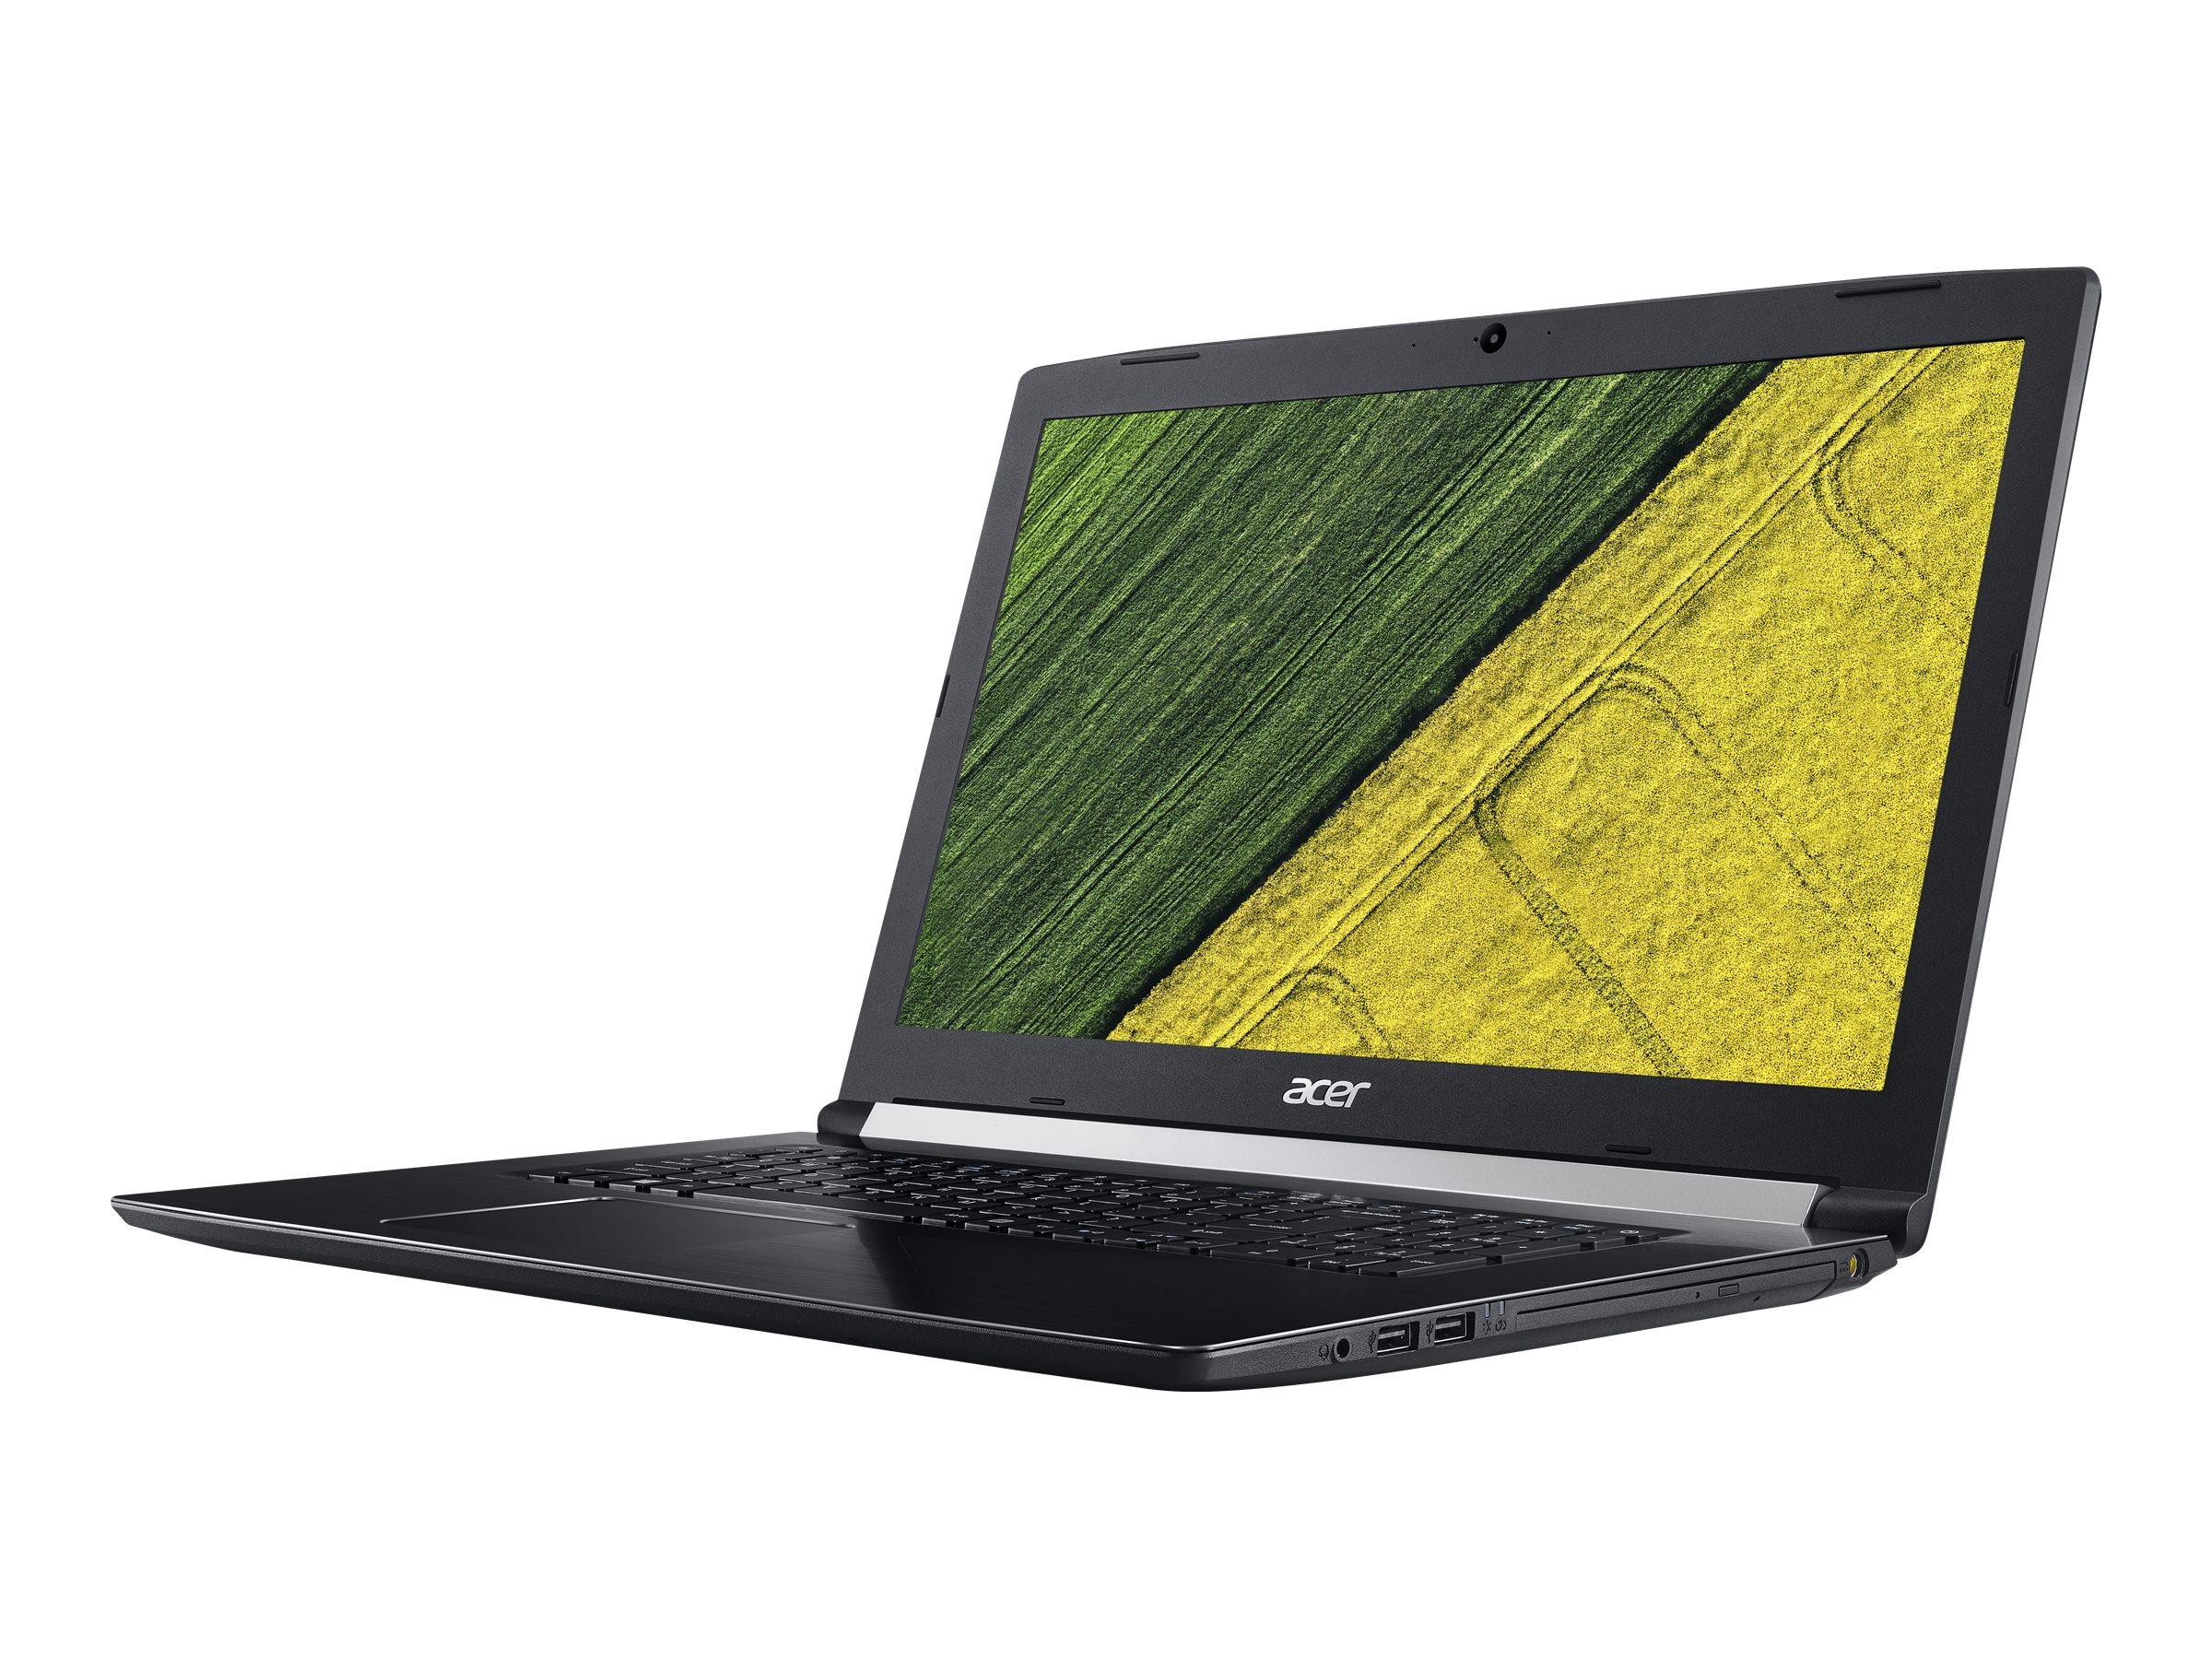 "Acer Aspire A517-51 - 17,3"" Notebook - Core i5 3,4 GHz 43,9 cm"